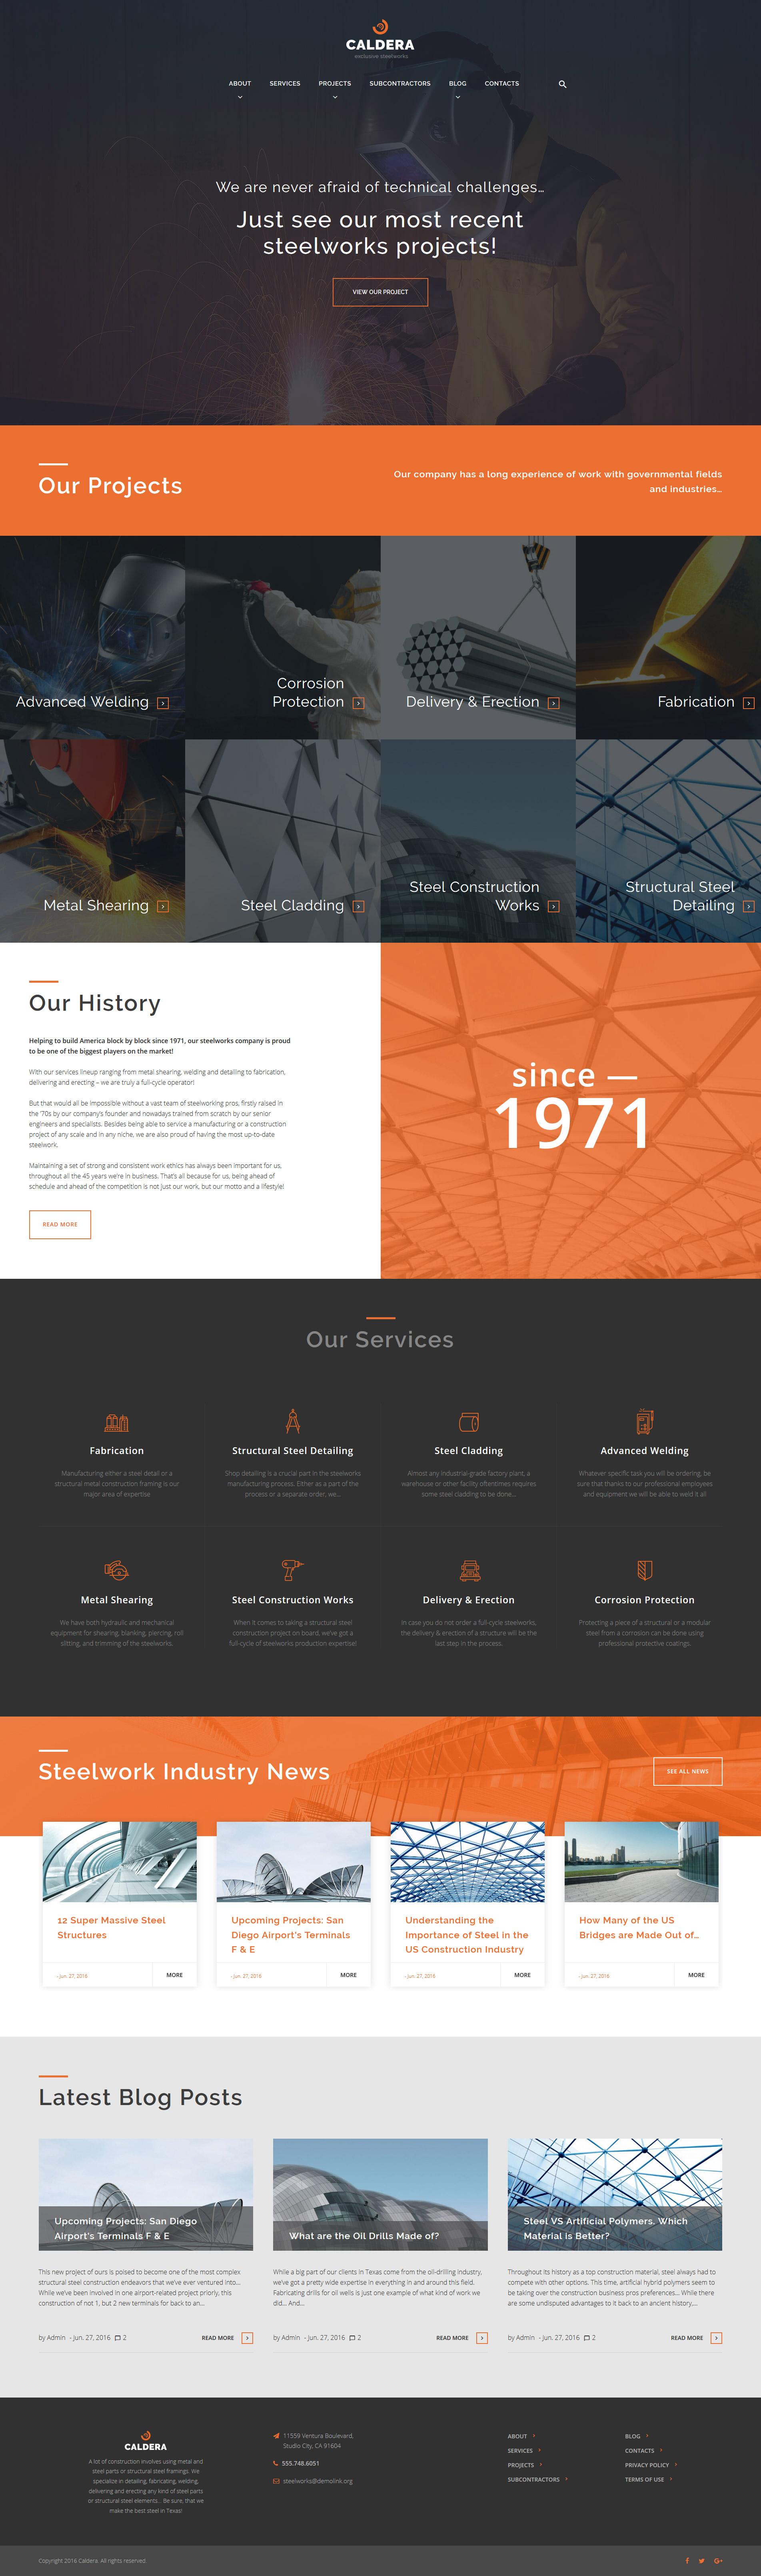 """Caldera - Steelworks and Constructions"" 响应式WordPress模板 #59027"